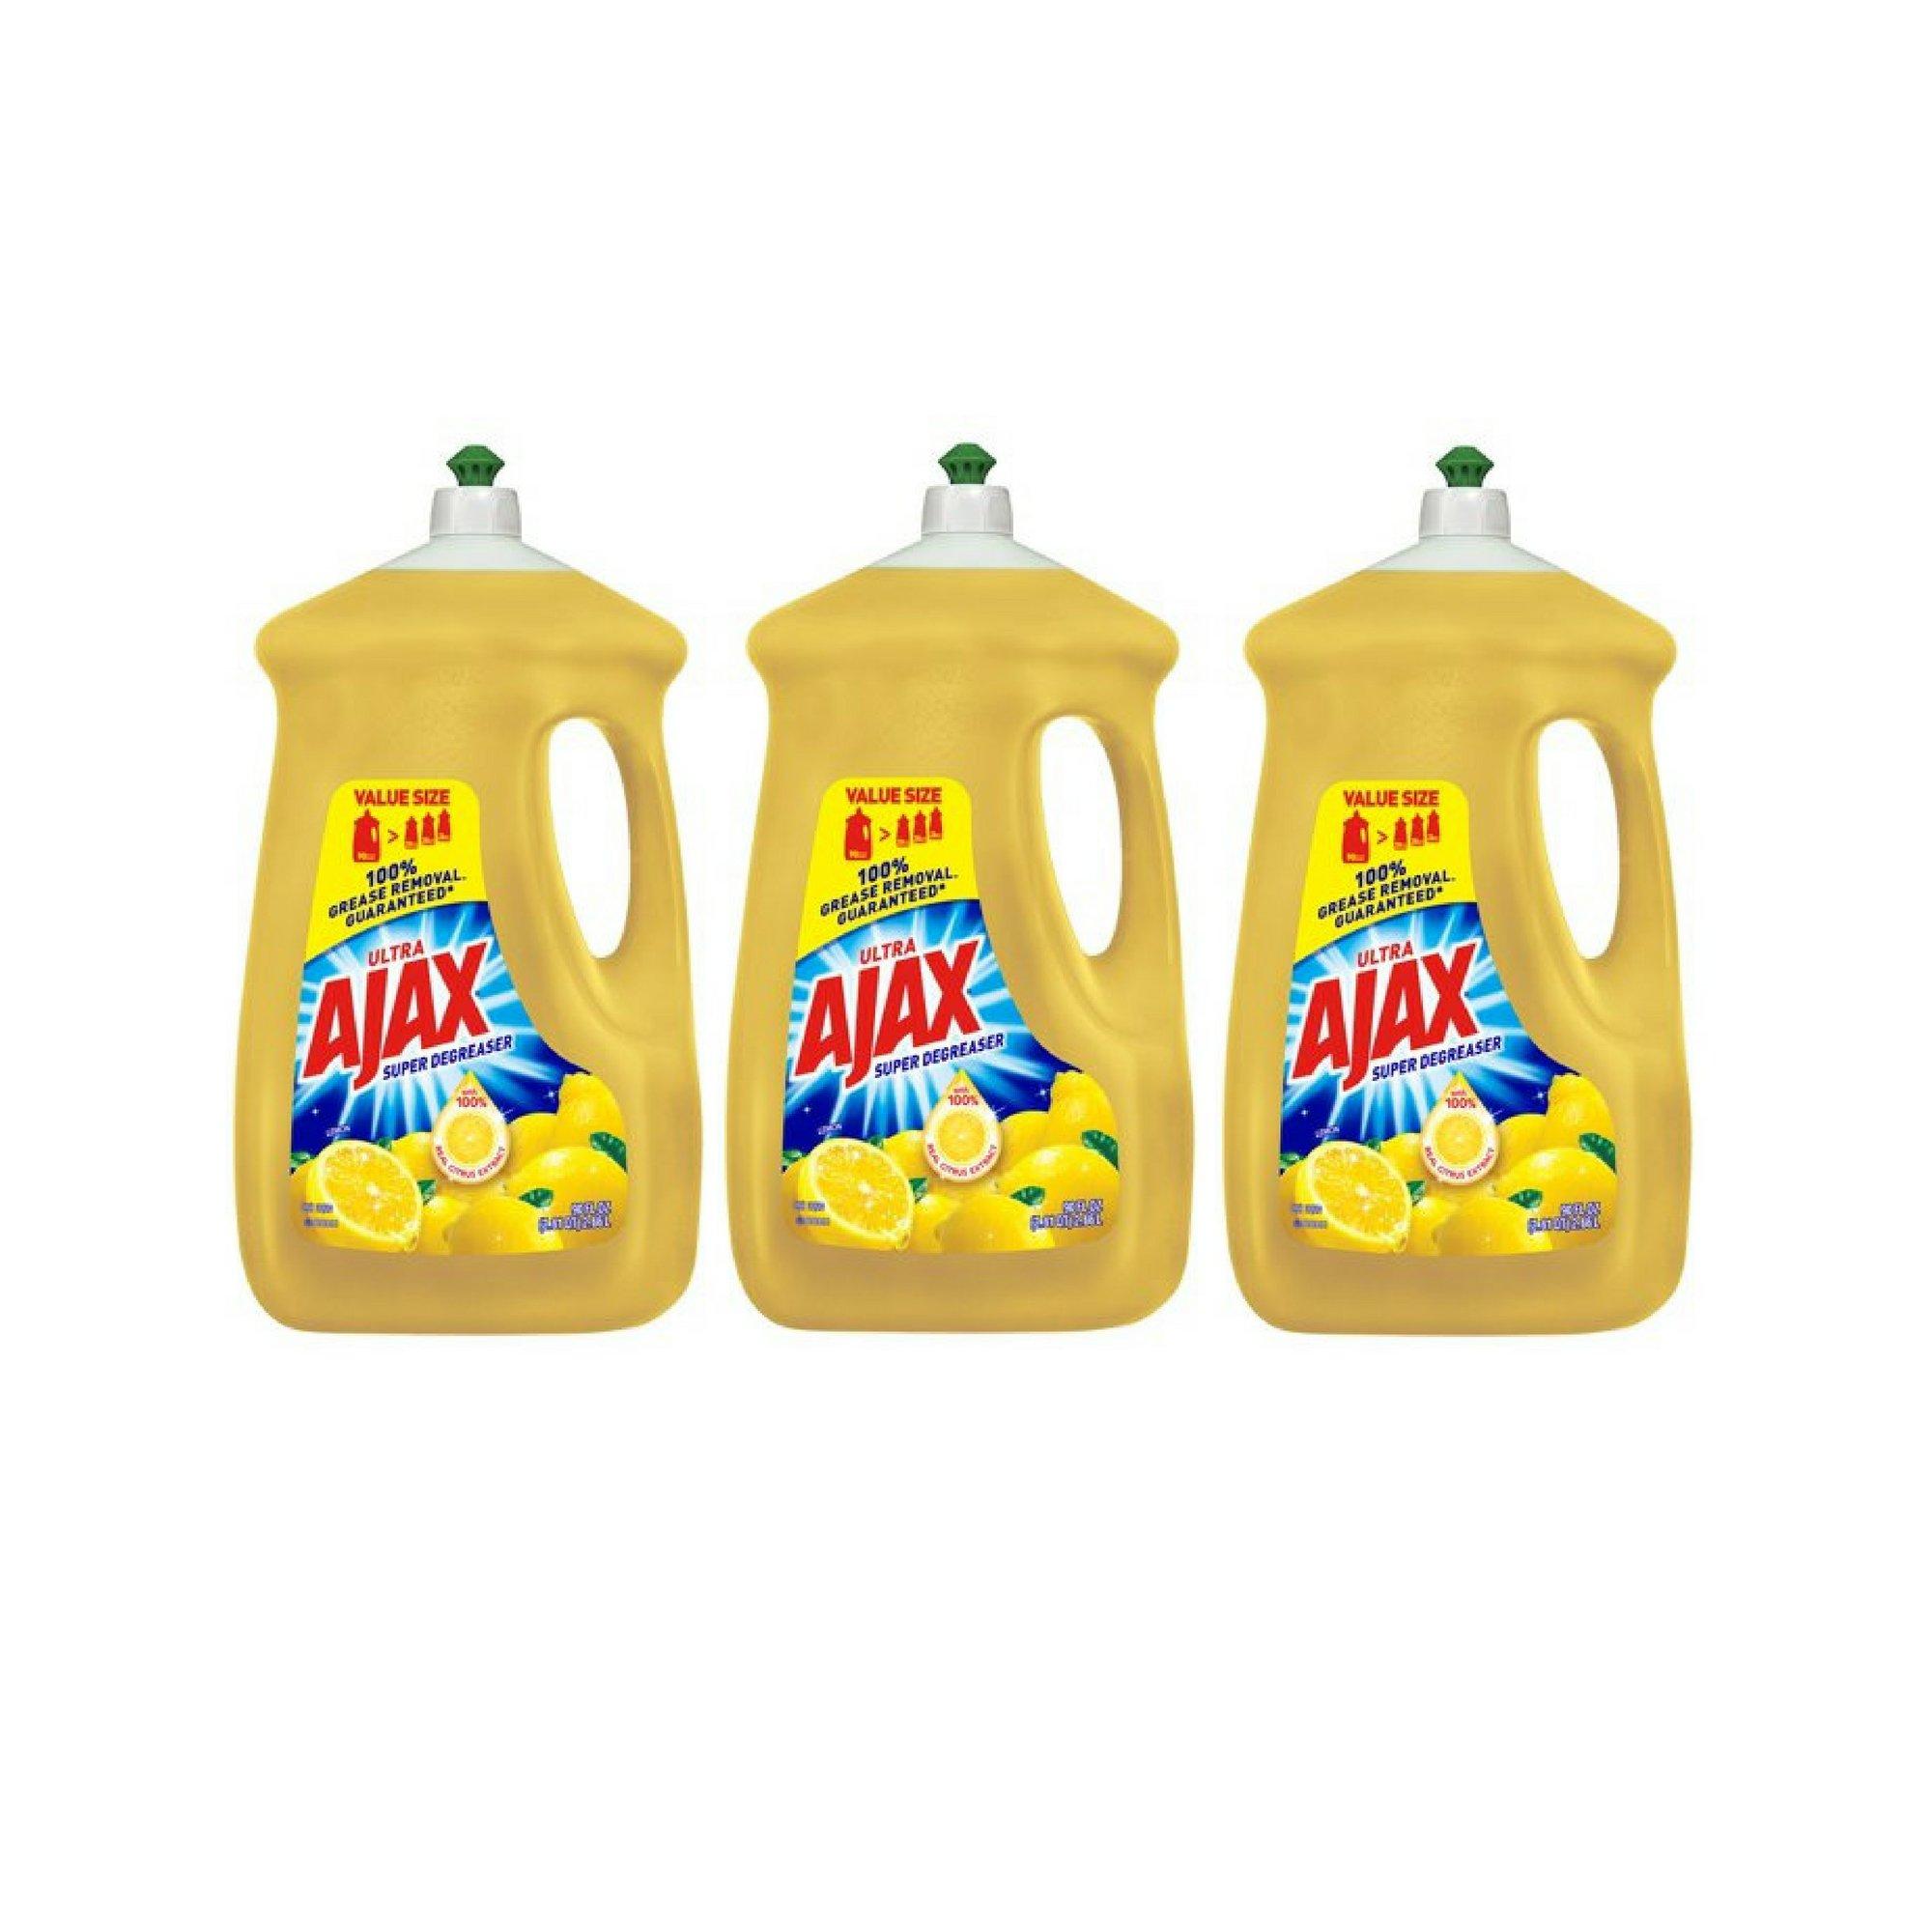 Ajax Ultra Triple Action Liquid Dish Soap, Lemon 90 fl oz - 3 Pack